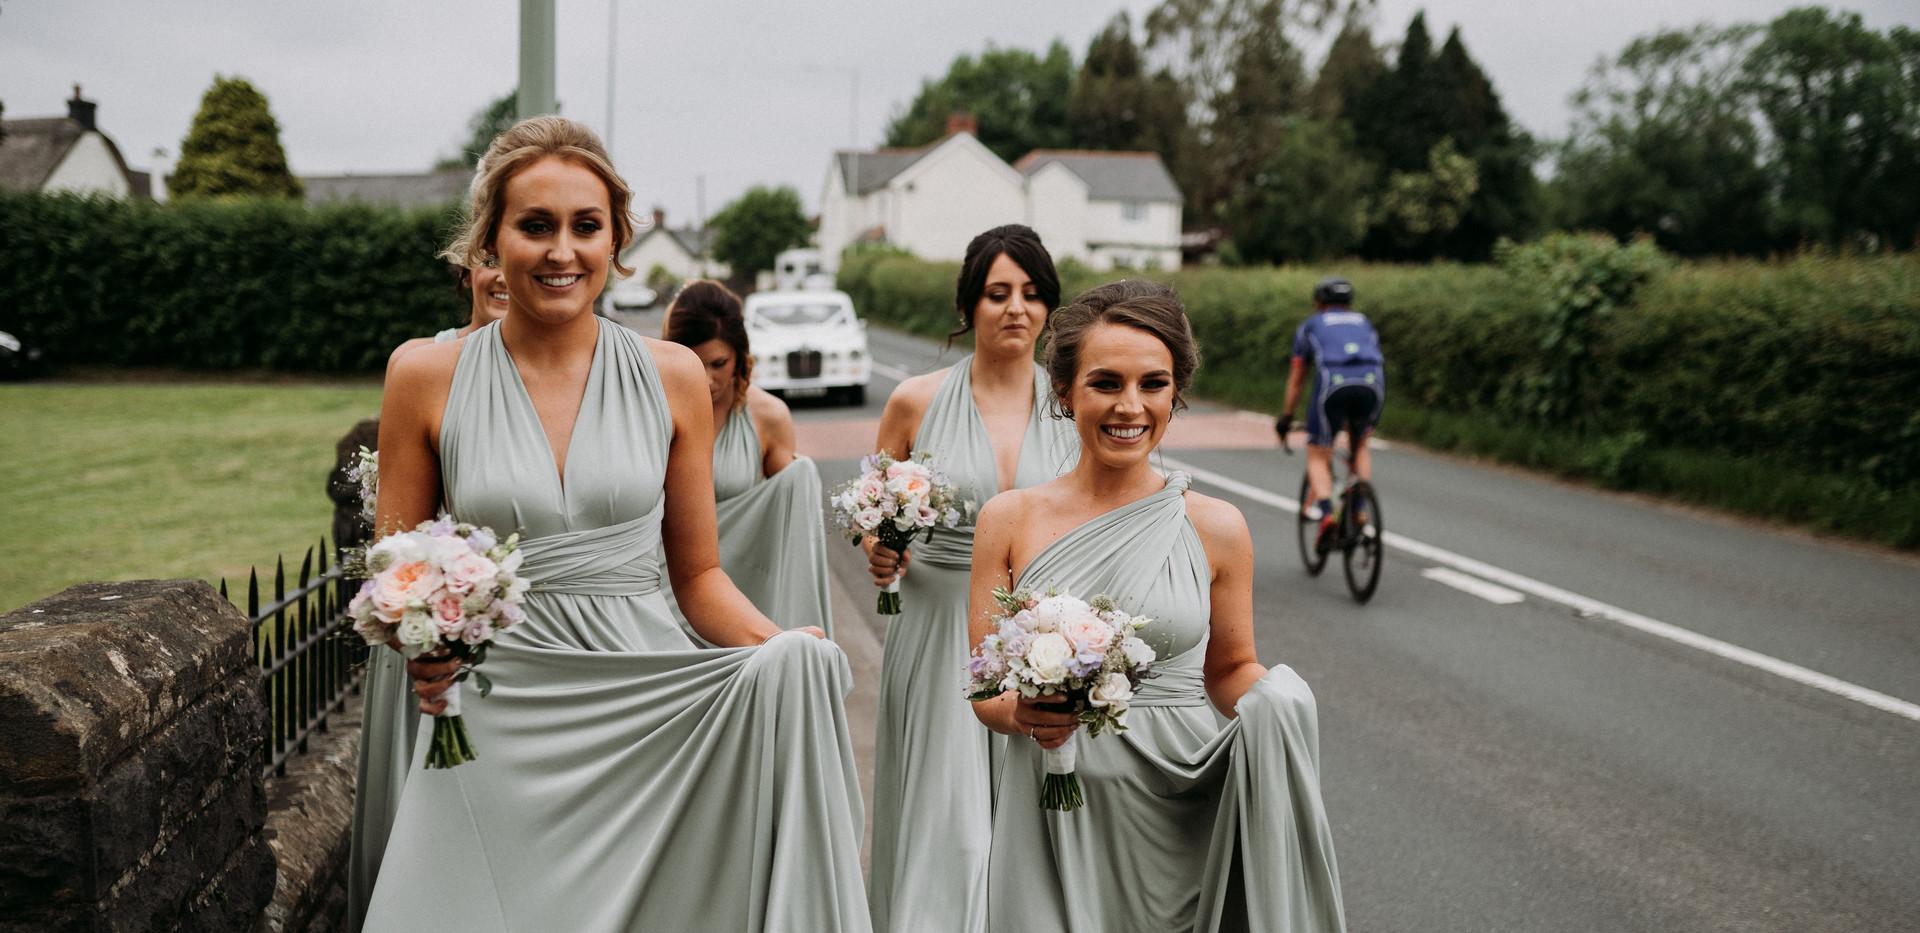 Bridesmaids' flowers